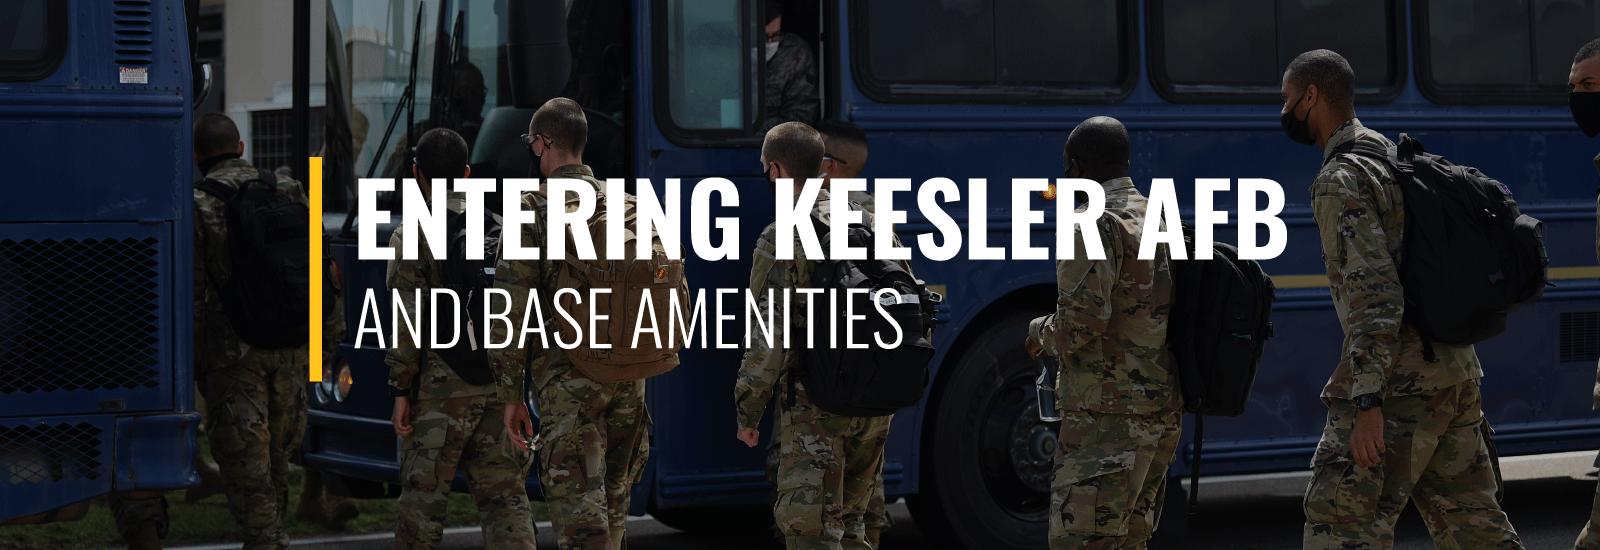 Entering Keesler Air Force Base and Base Amenities